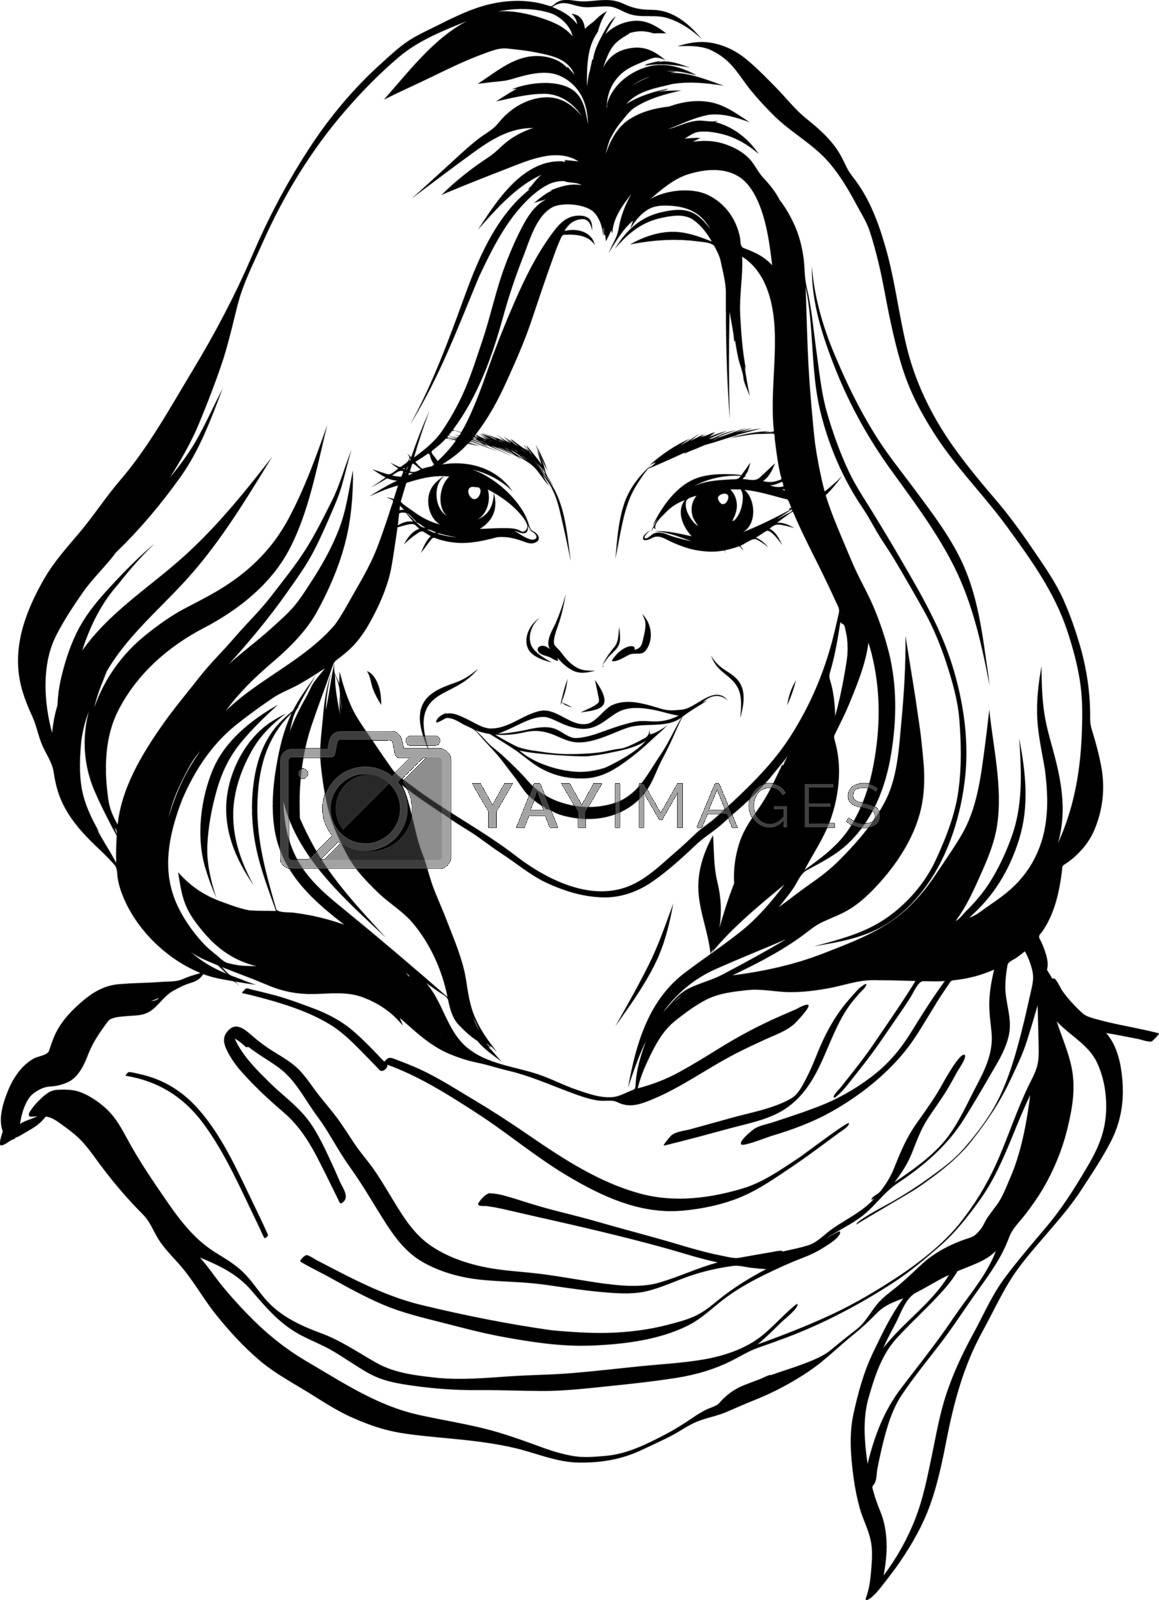 Single Sketch Female Face. Illustration on White Background